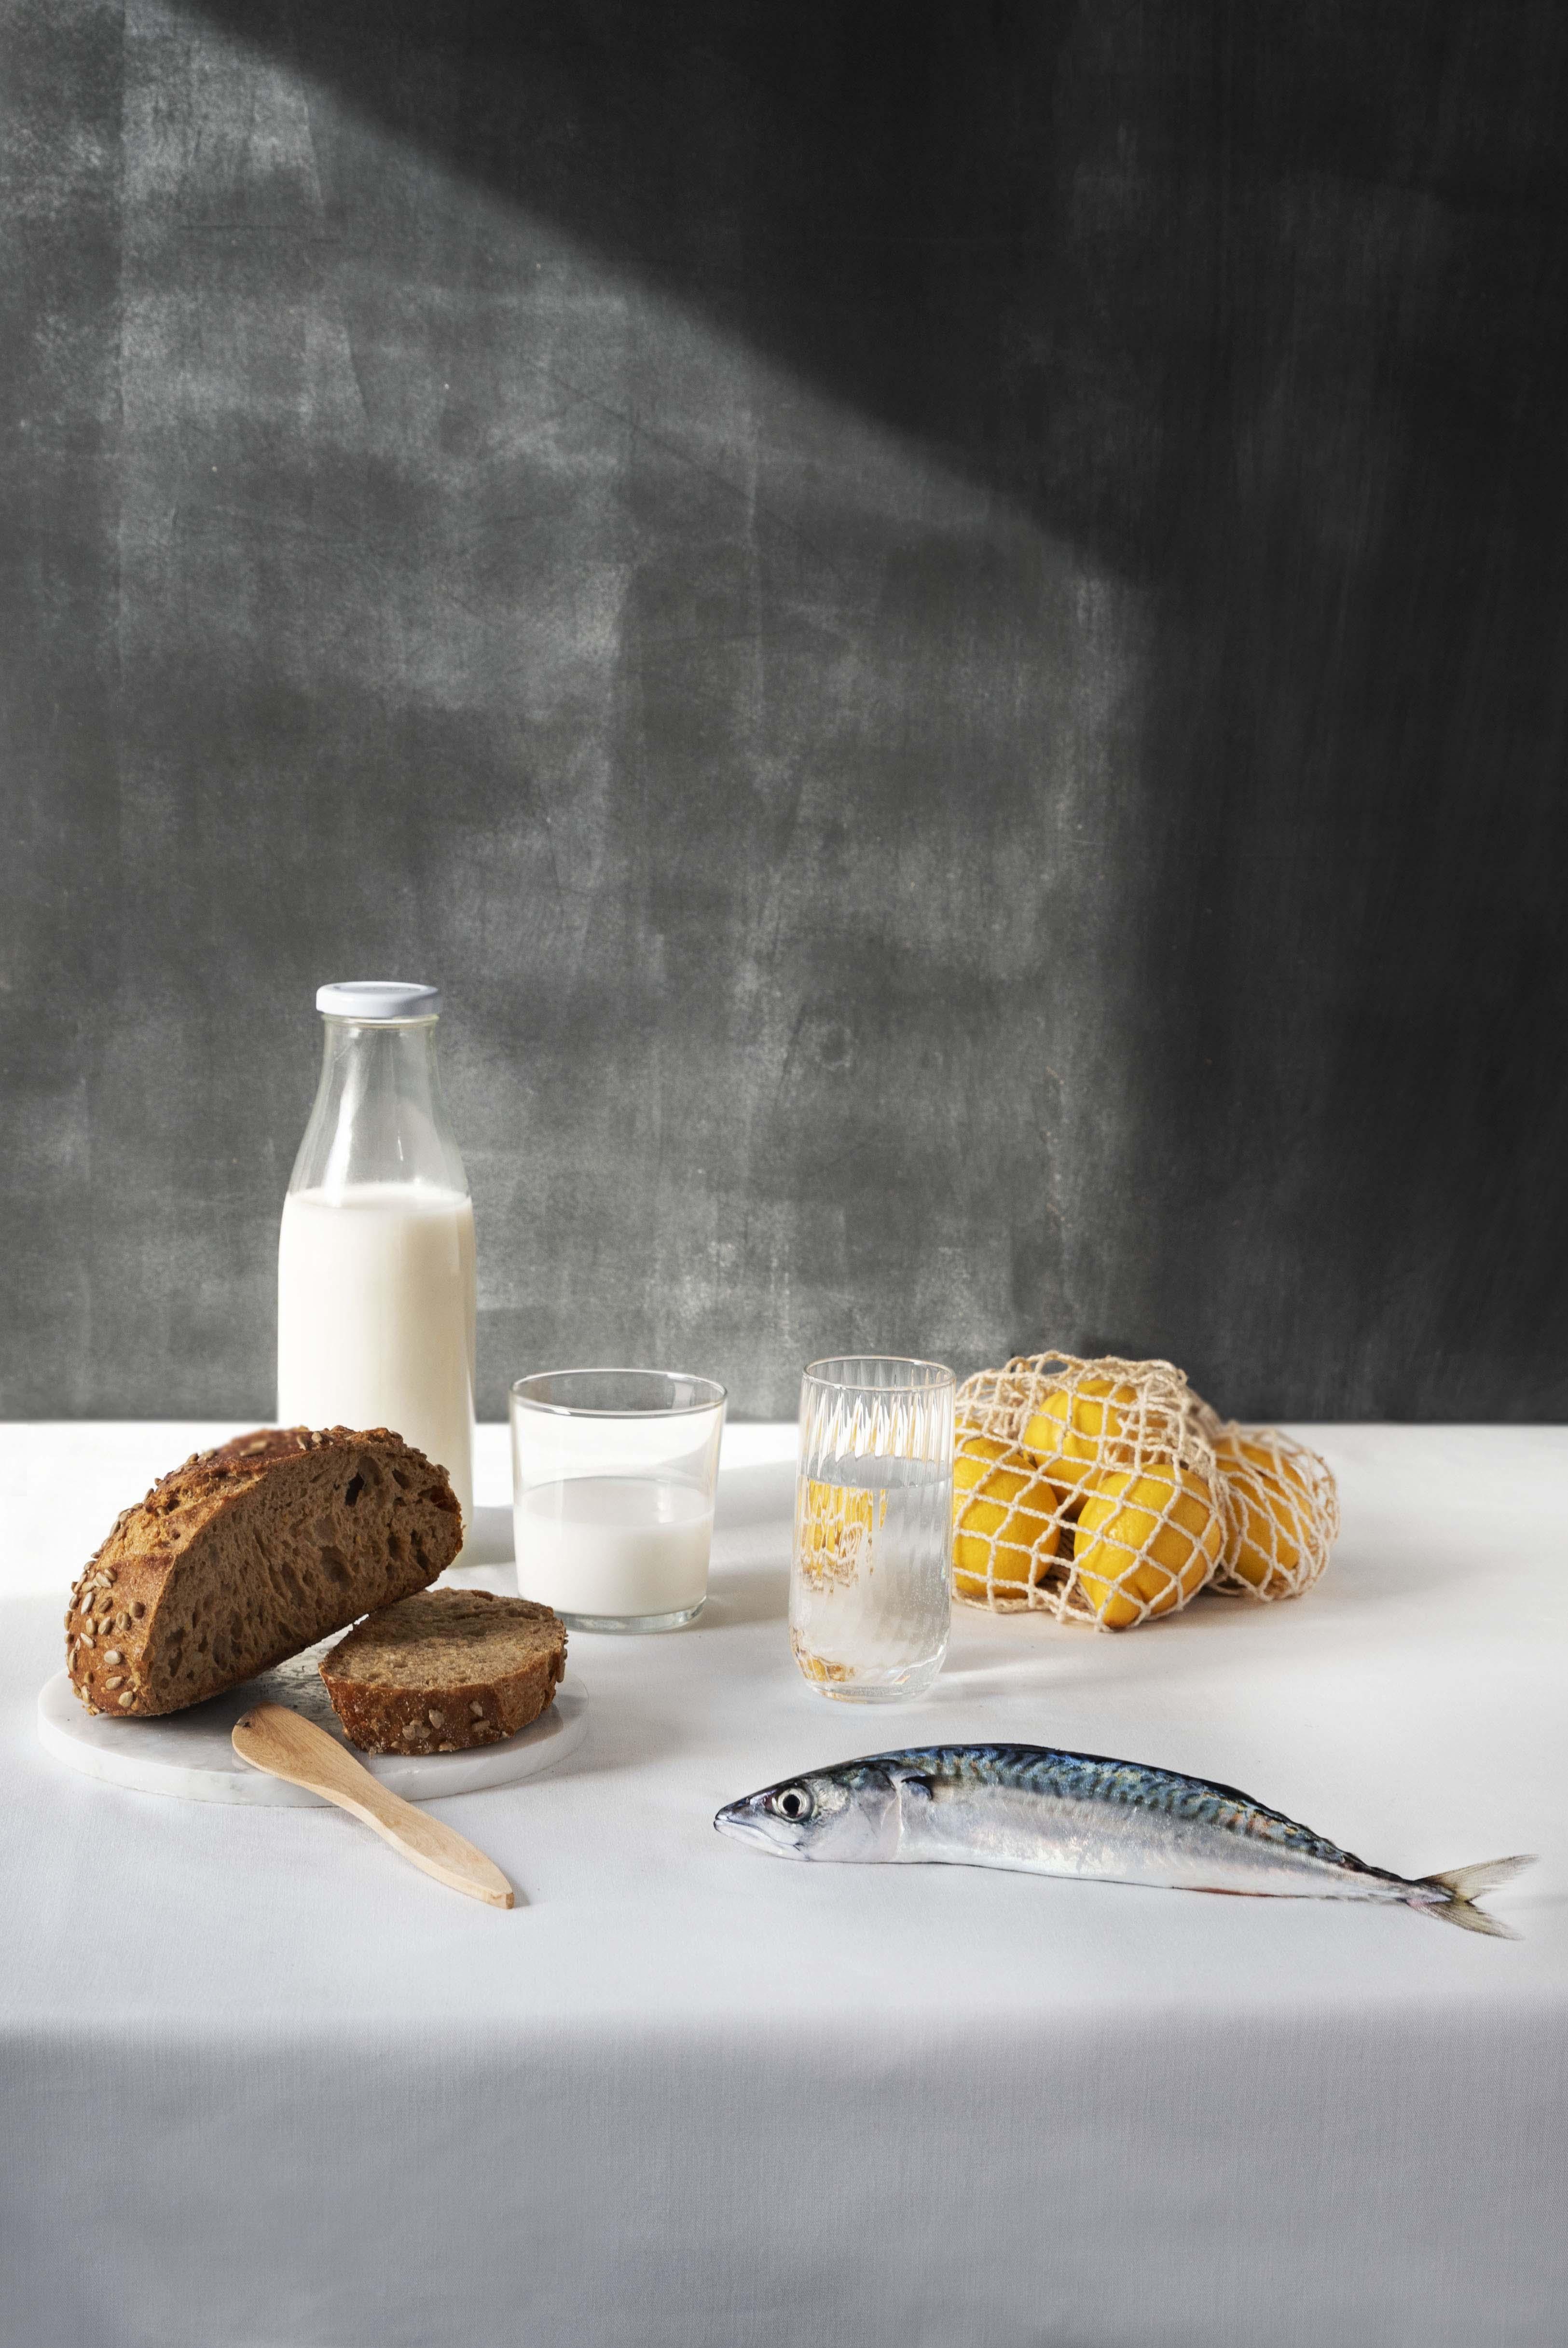 foodfotografie-fotografie-denhaag-sophie